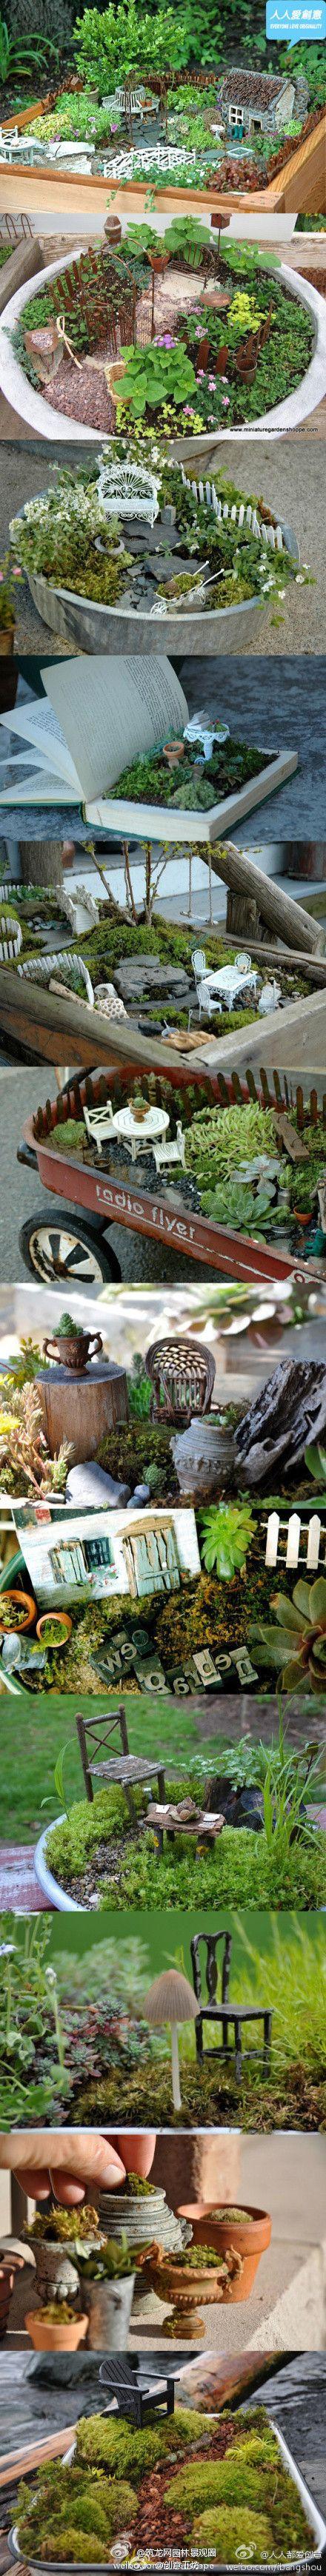 mini garden: